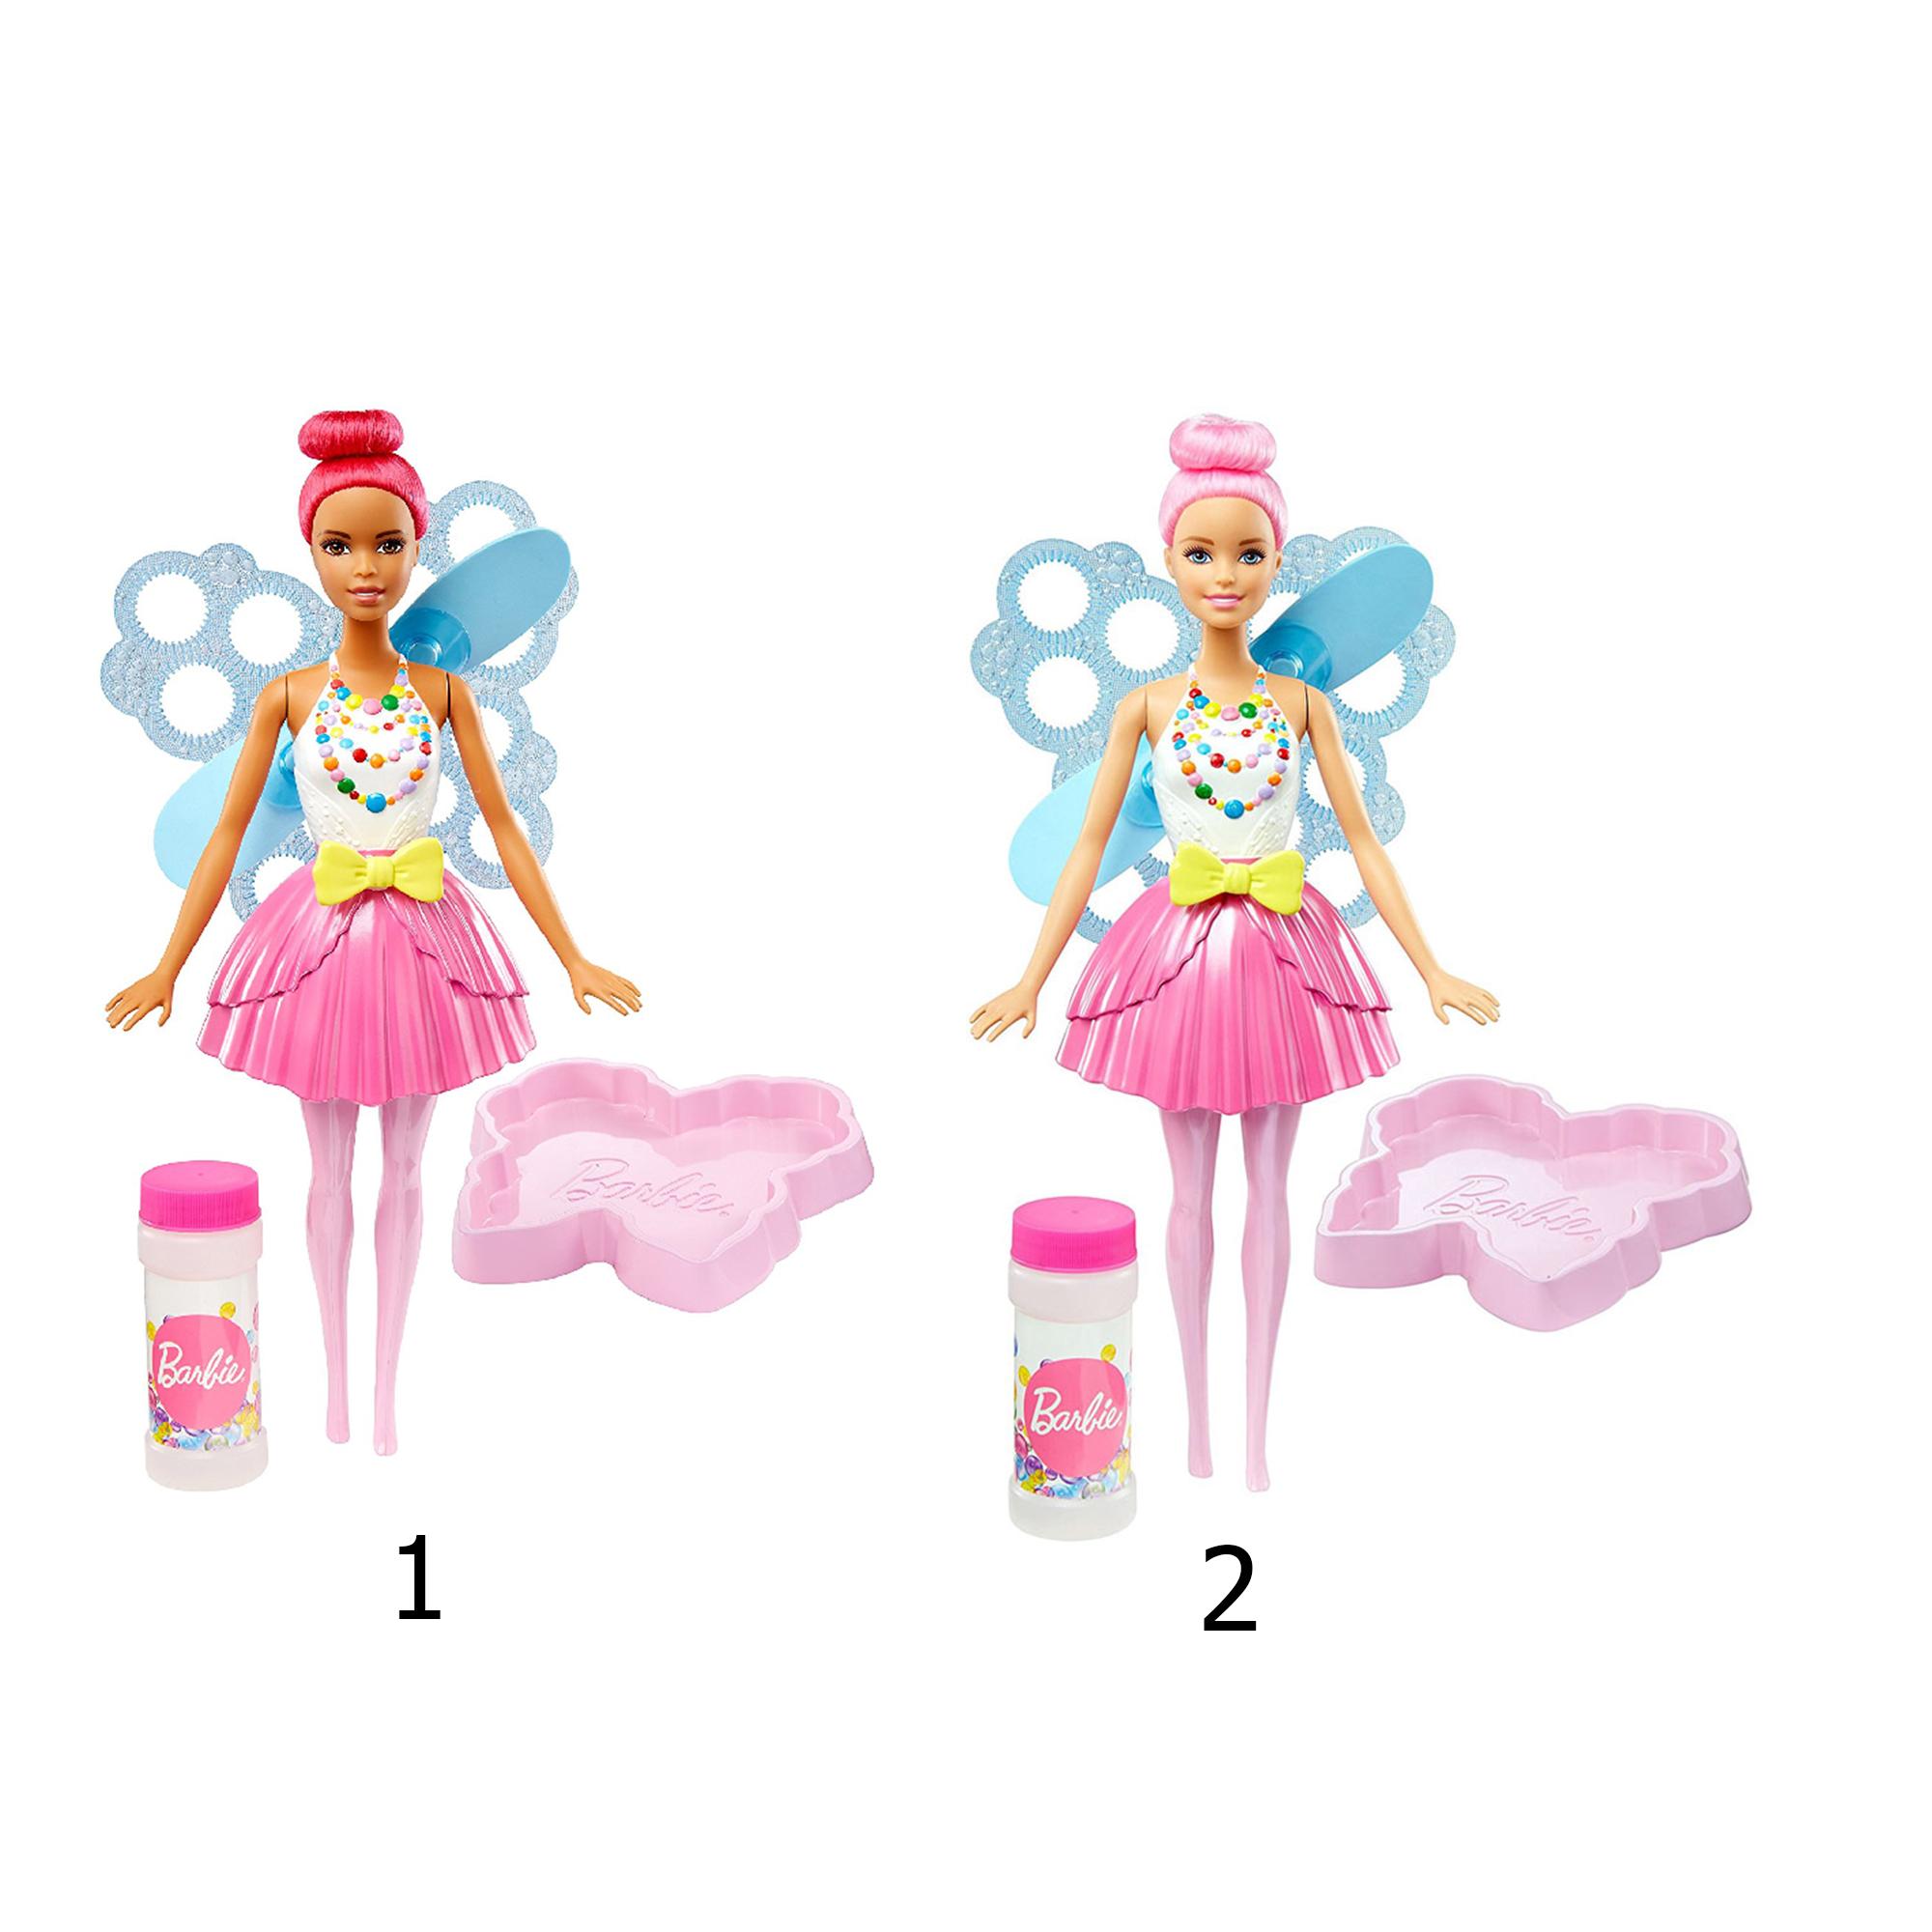 Barbie - Феи с волшебными пузырькамиКуклы Barbie (Барби)<br>Barbie - Феи с волшебными пузырьками<br>